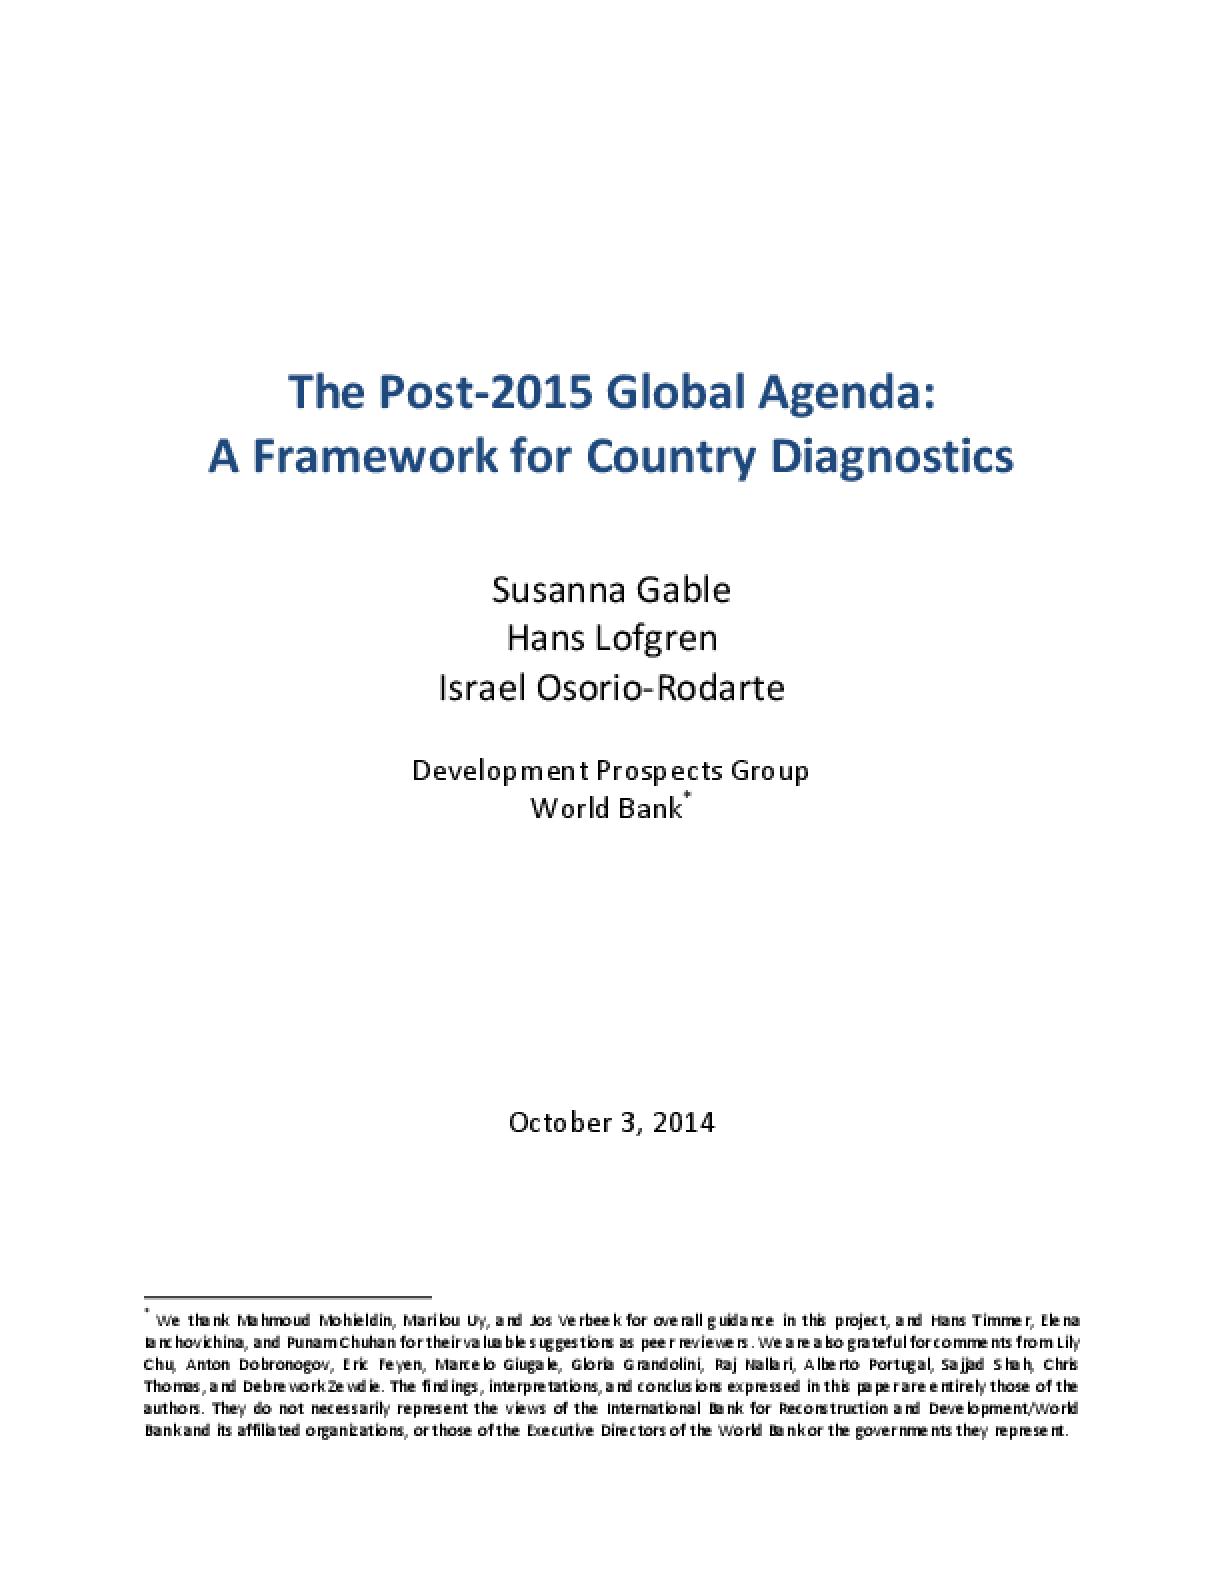 The Post-2015 Global Agenda: A Framework for Country Diagnostics